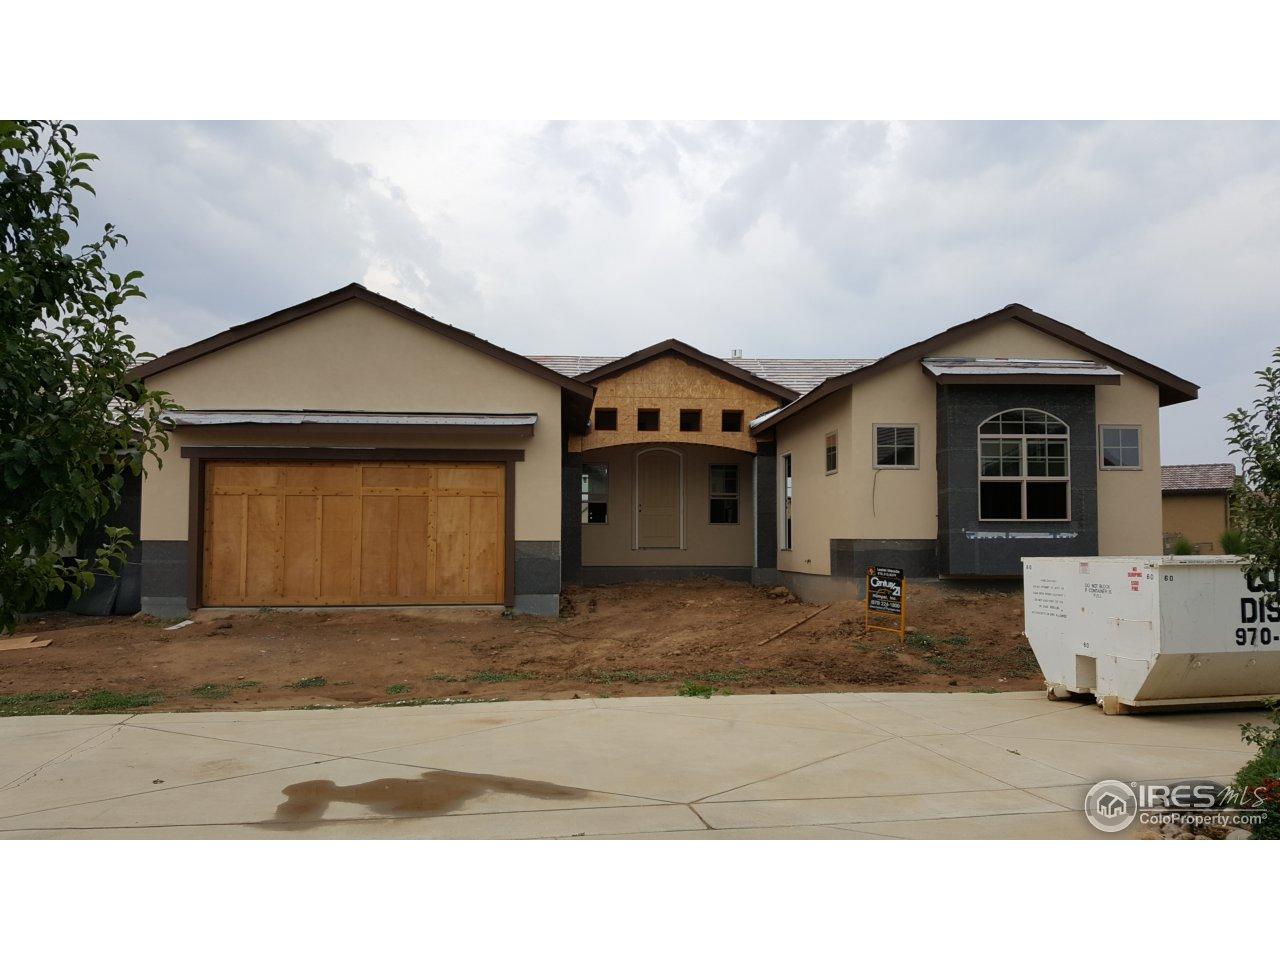 4016 Rock Creek Dr, Fort Collins, CO 80528